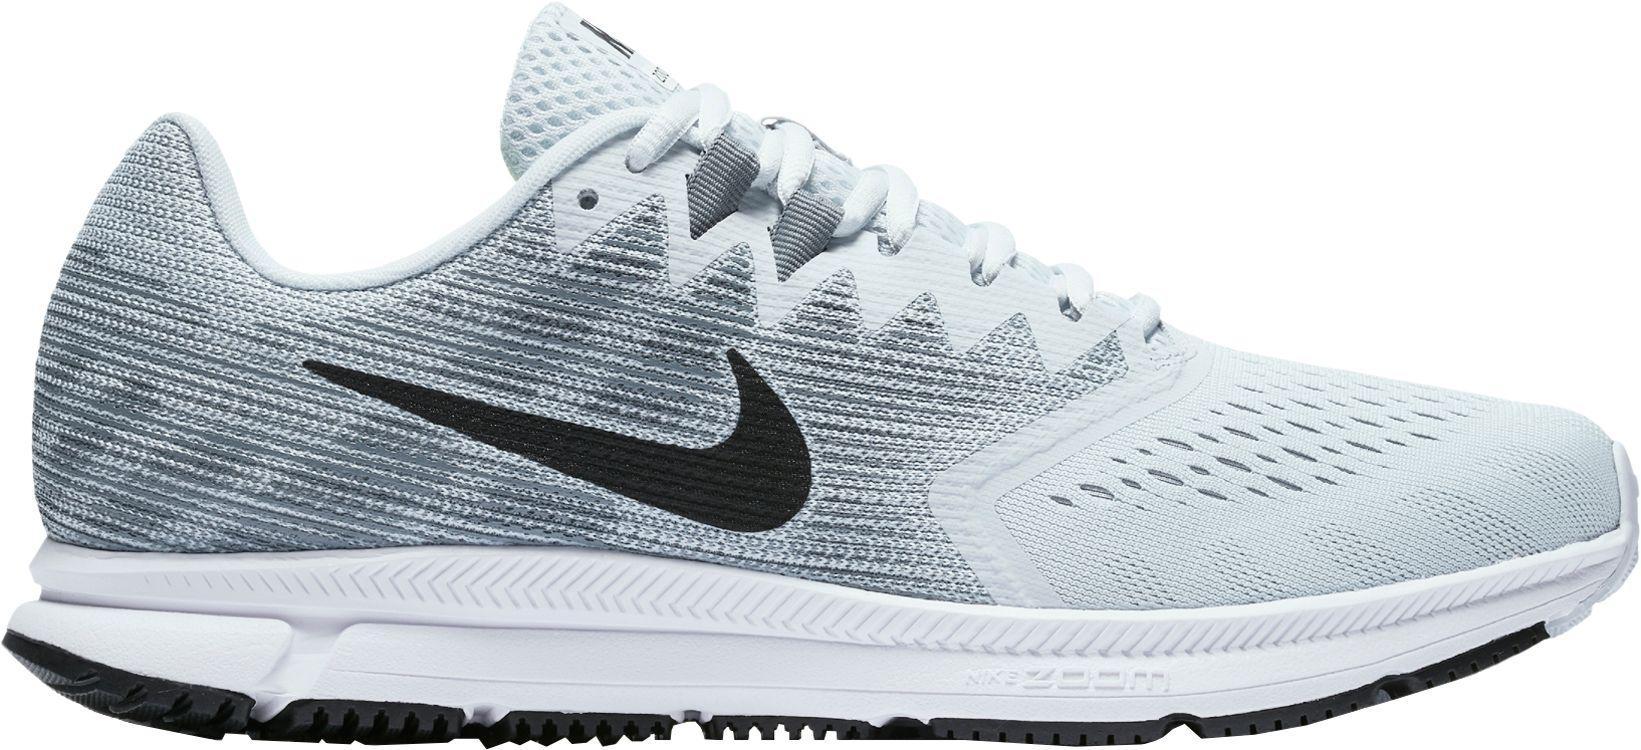 Men's Nike Mens Zoom Span Running Shoe Running Running Road